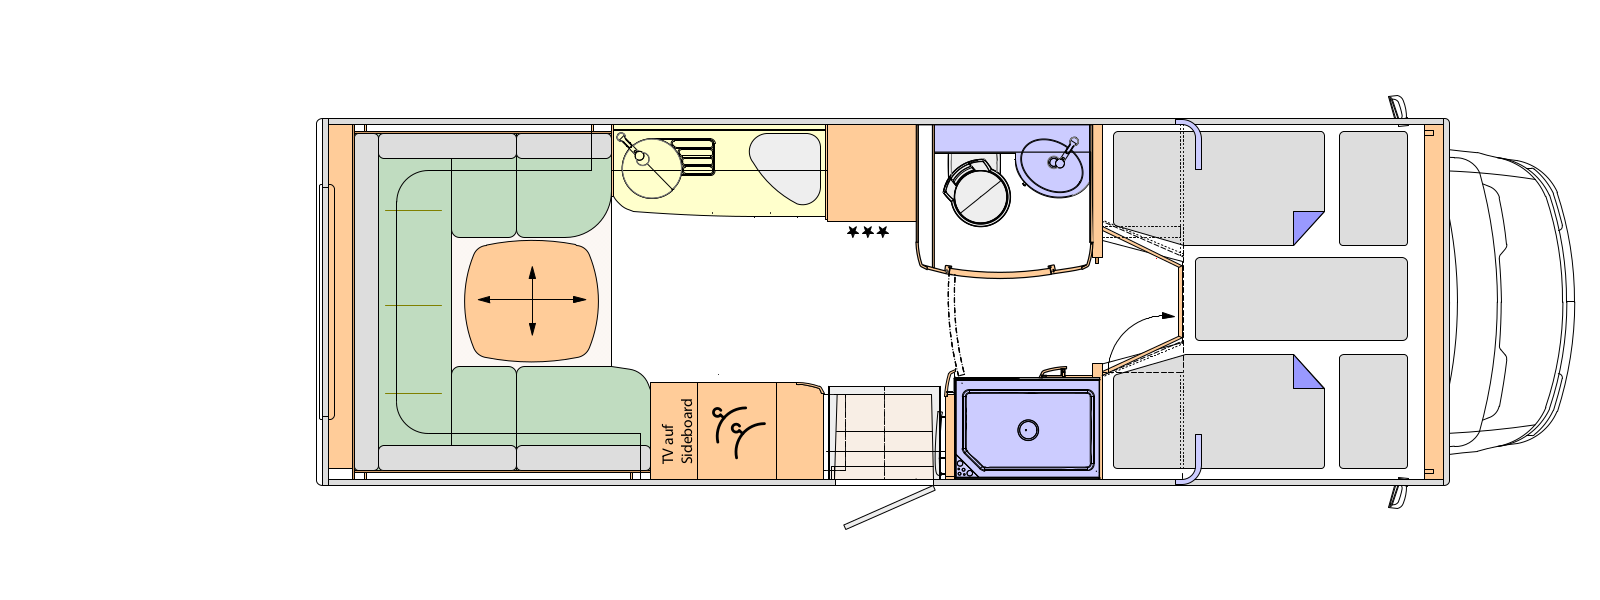 6f3d102b0aa1d8 2017 Concorde Cruiser 791RL Iveco Daily Coachbuilt Motorhome